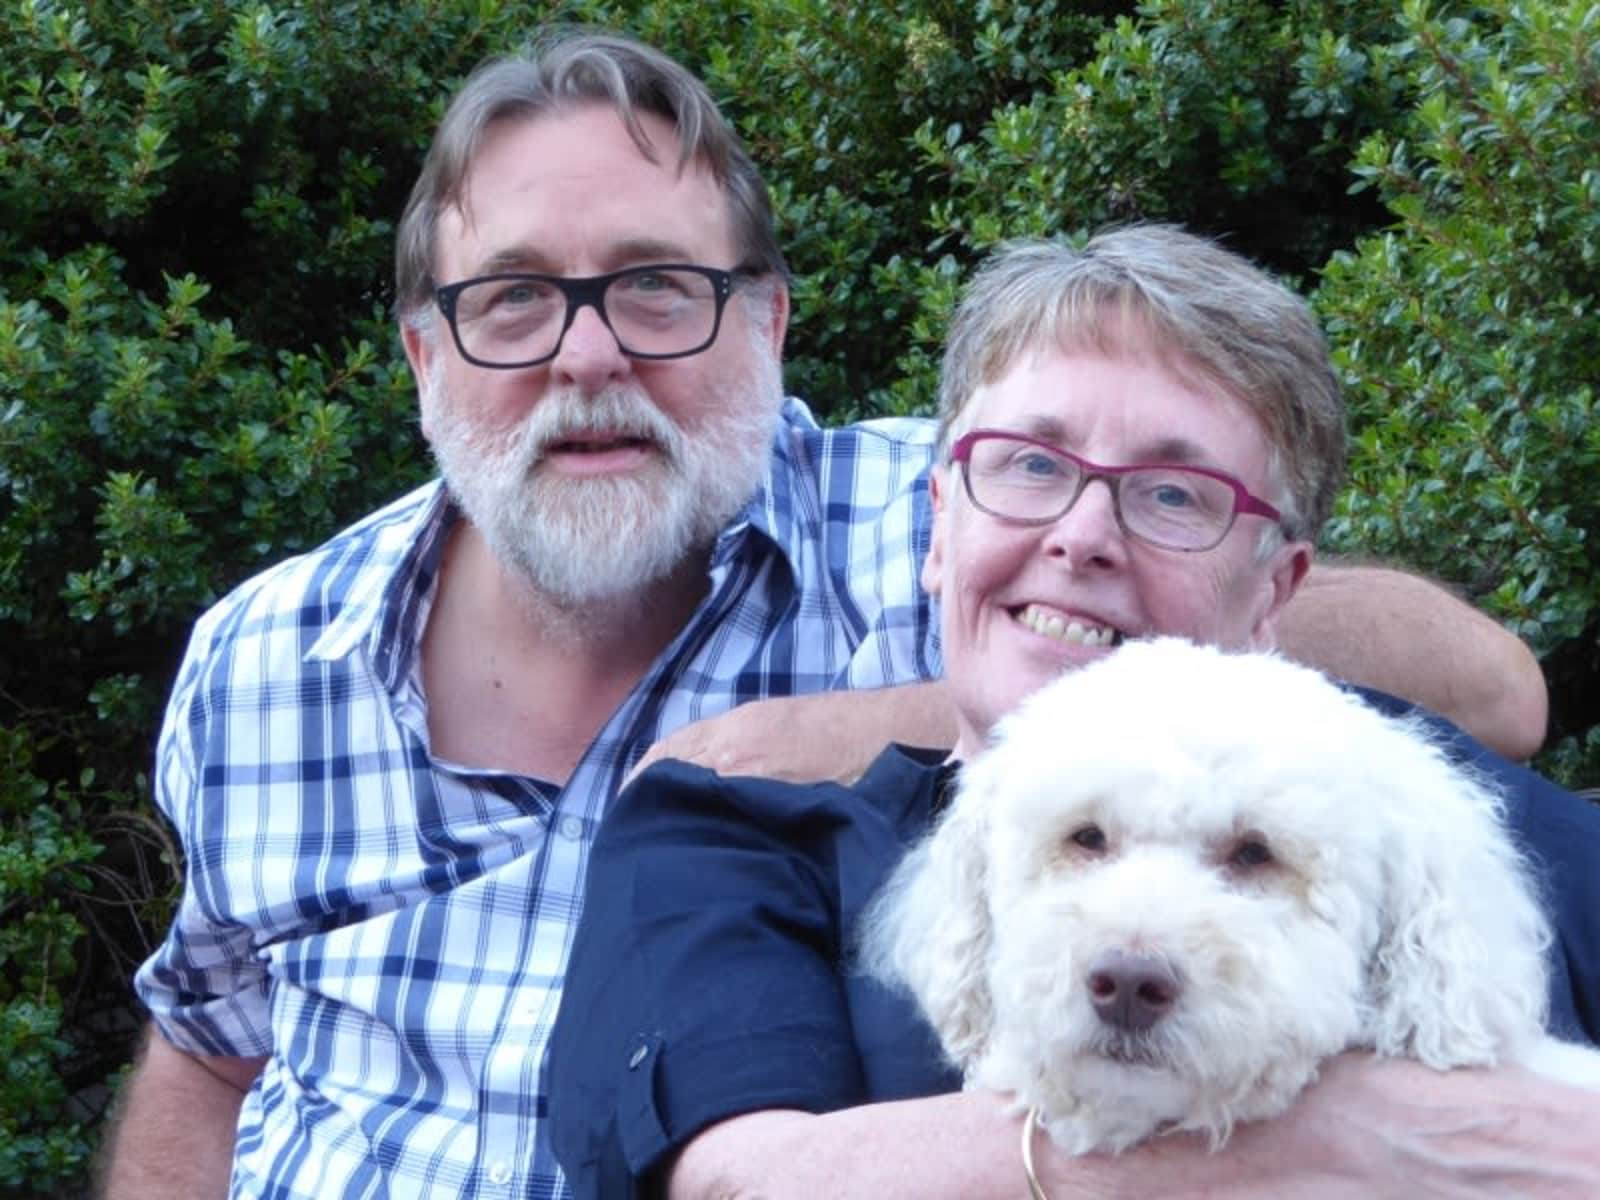 Chris & Philip from Melbourne, Victoria, Australia